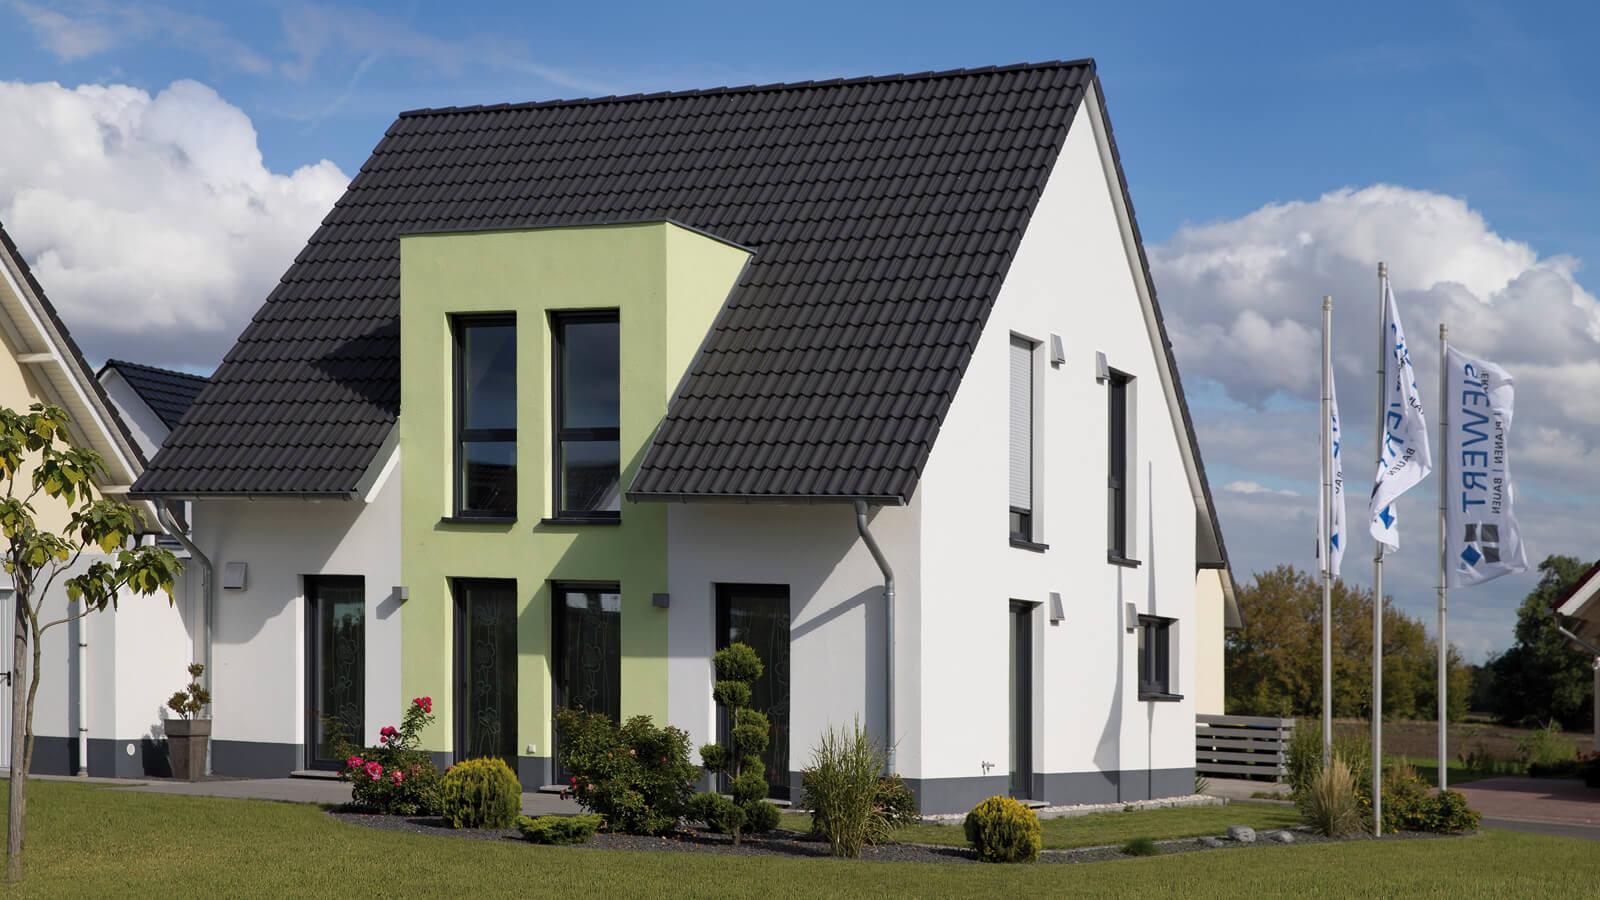 Musterhaus bierrain siewert hausbau for Haus bauen 2016